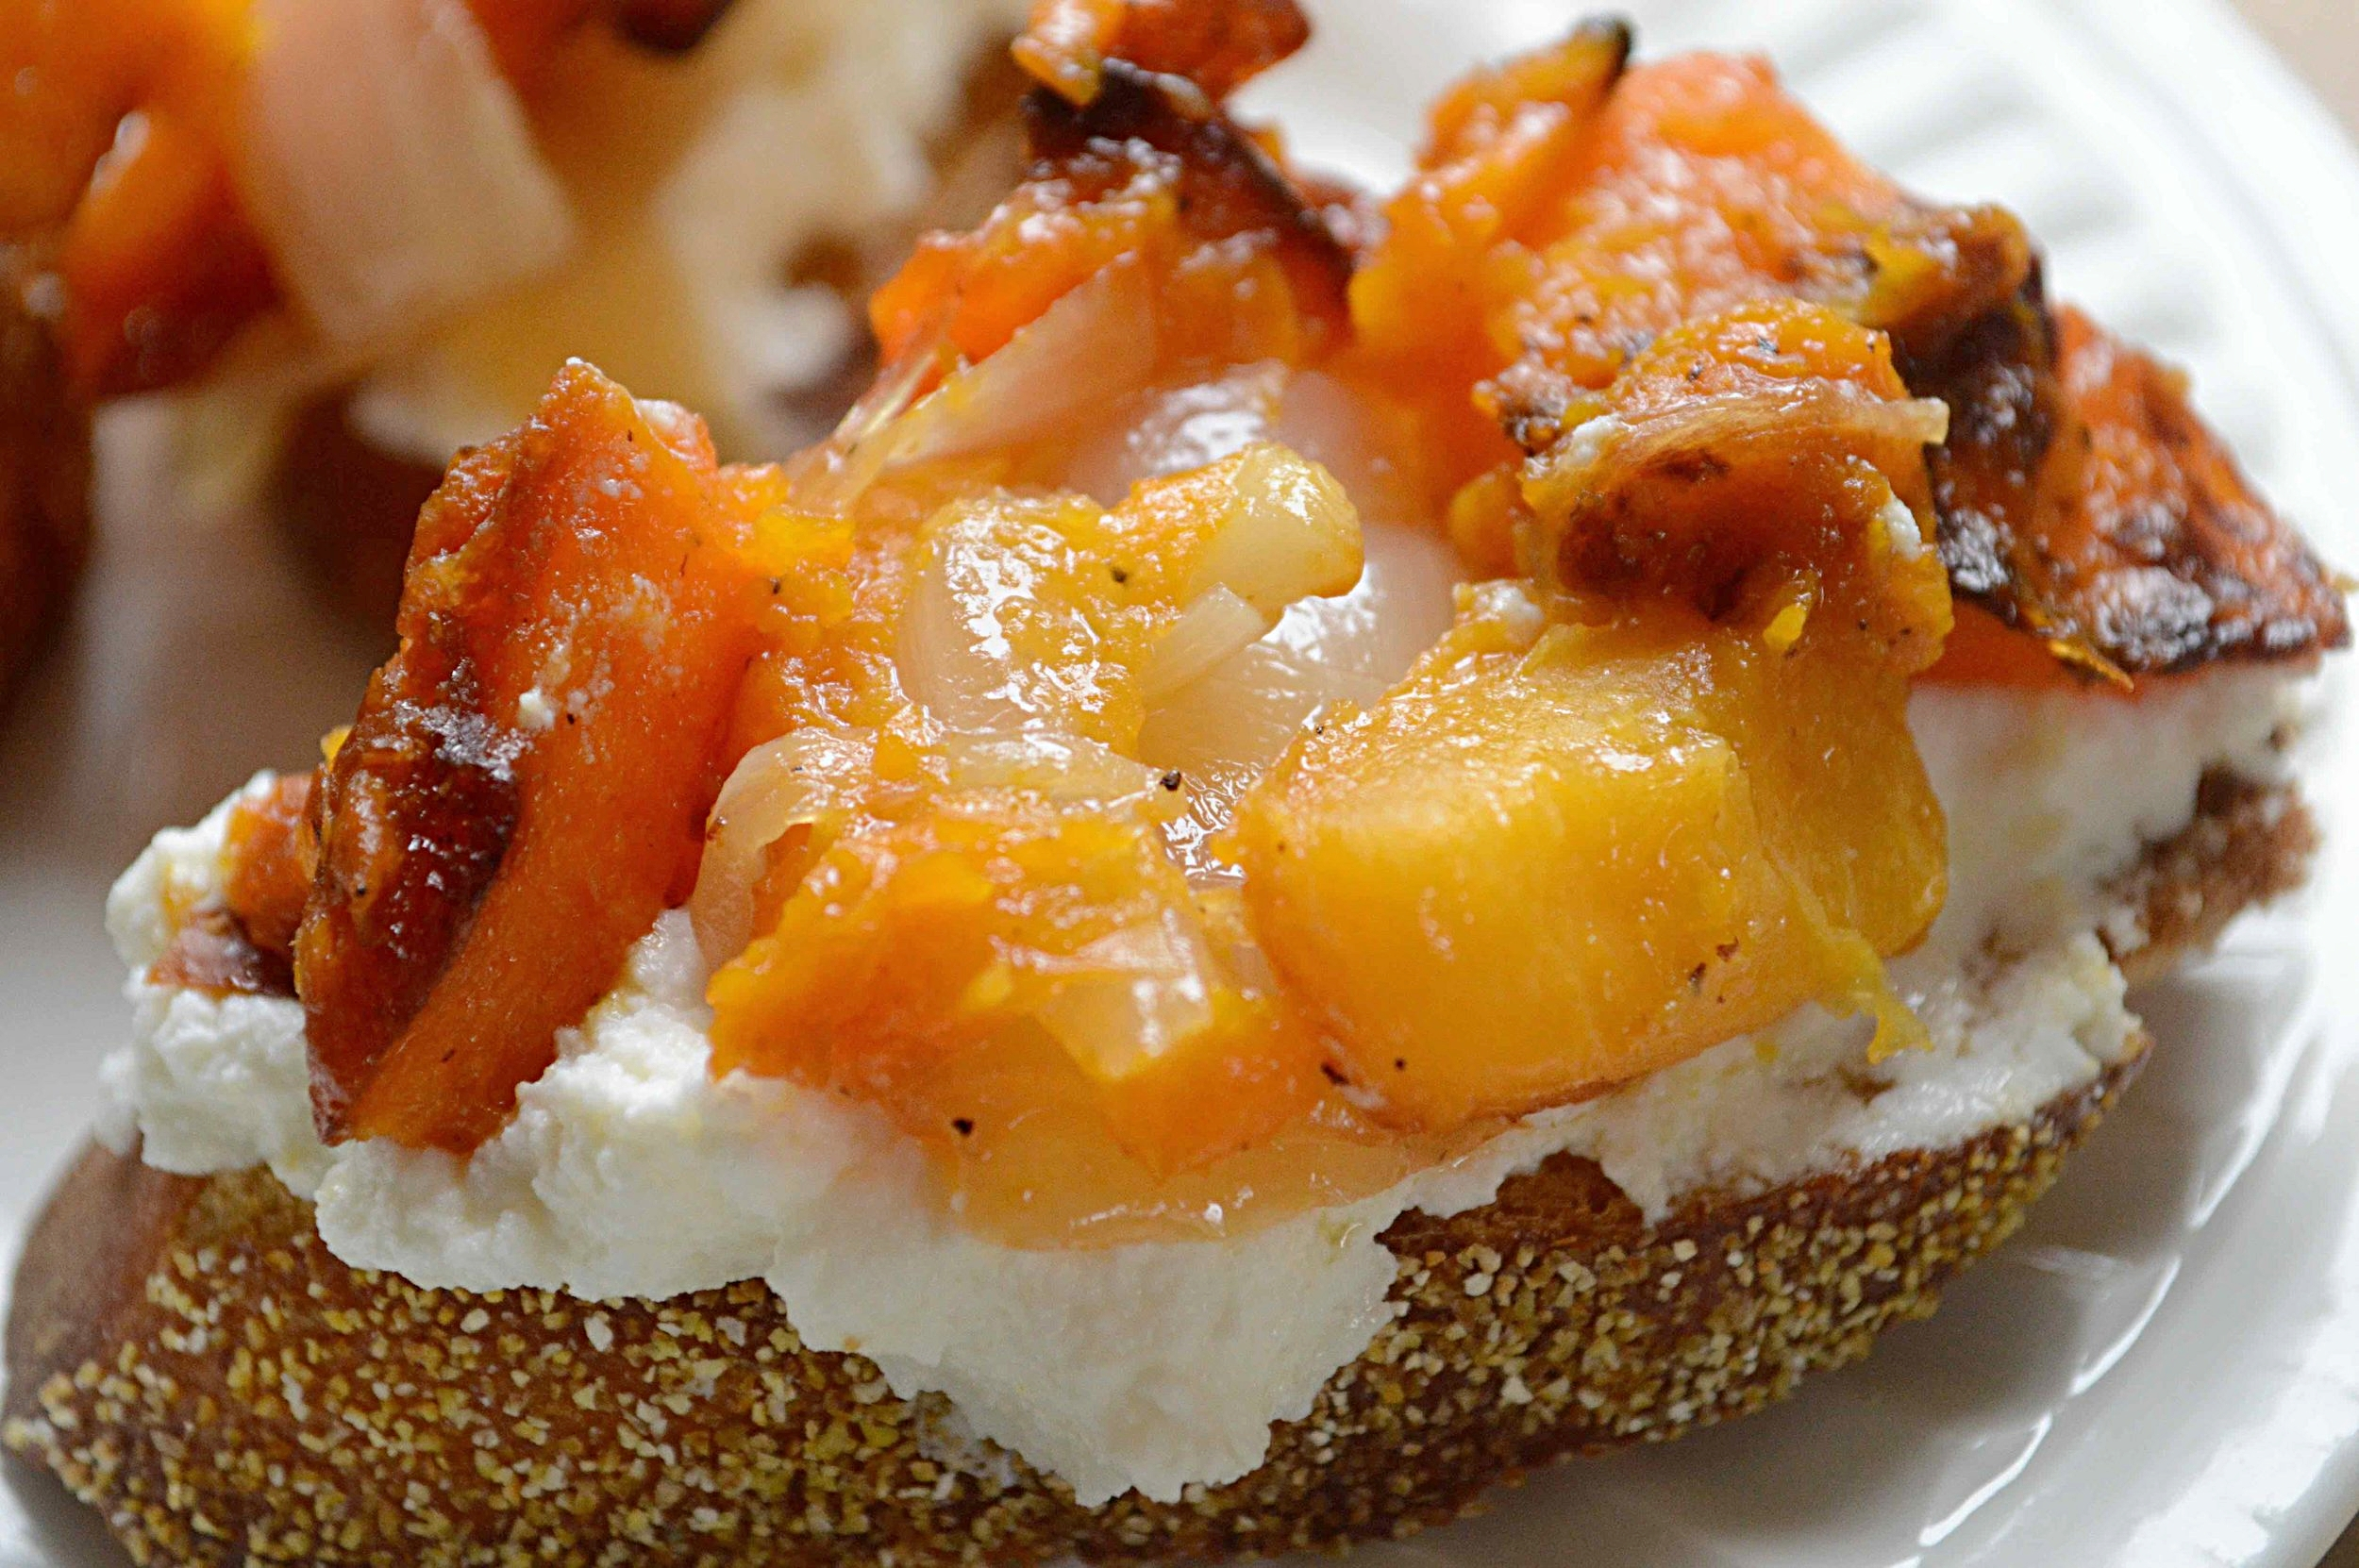 Butternut Squash, Onion and Ricotta Bruschetta